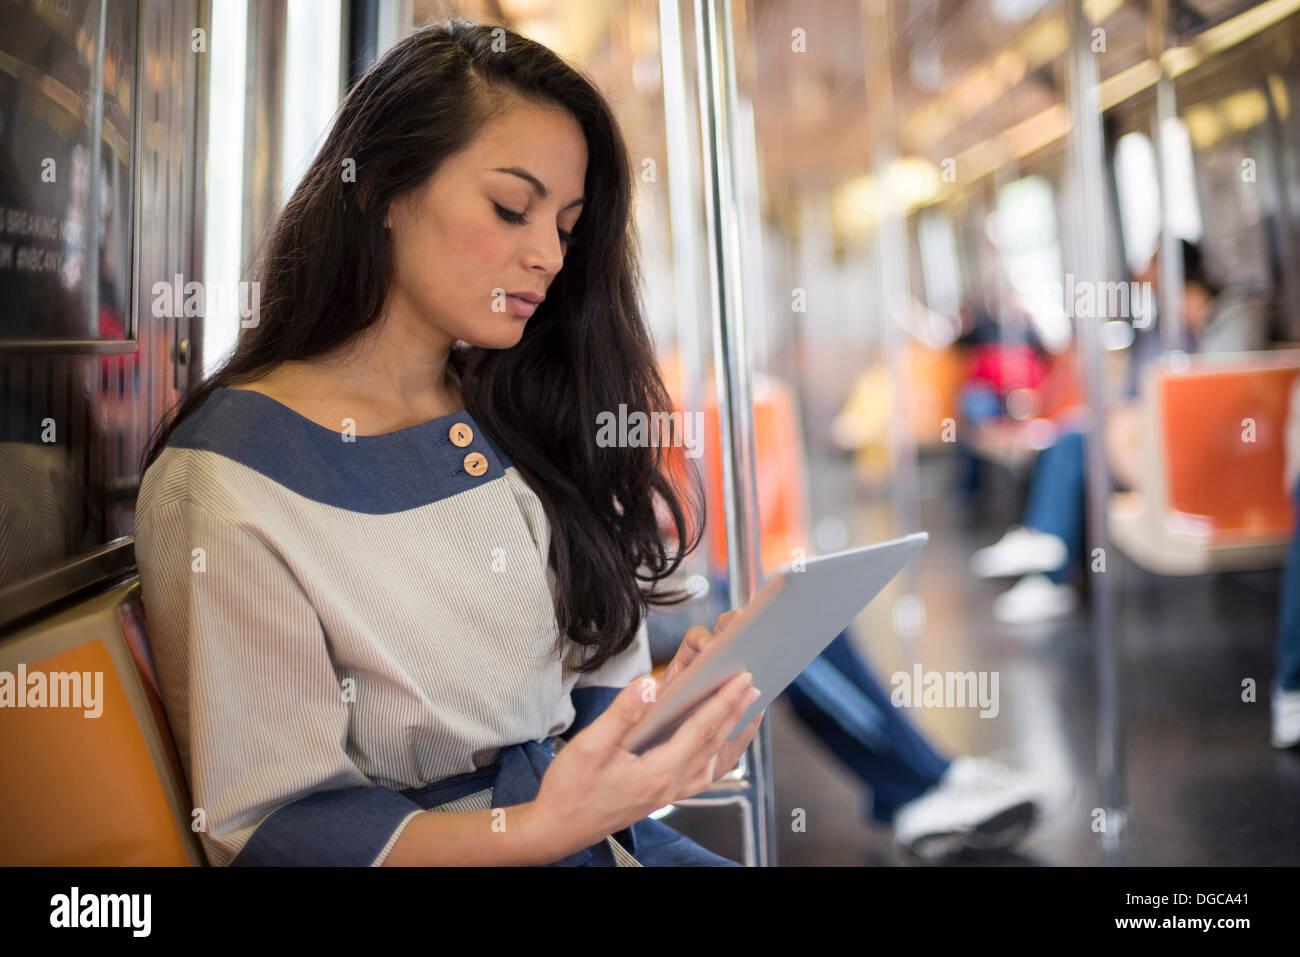 Woman using digital tablet on subway, New York Photo Stock